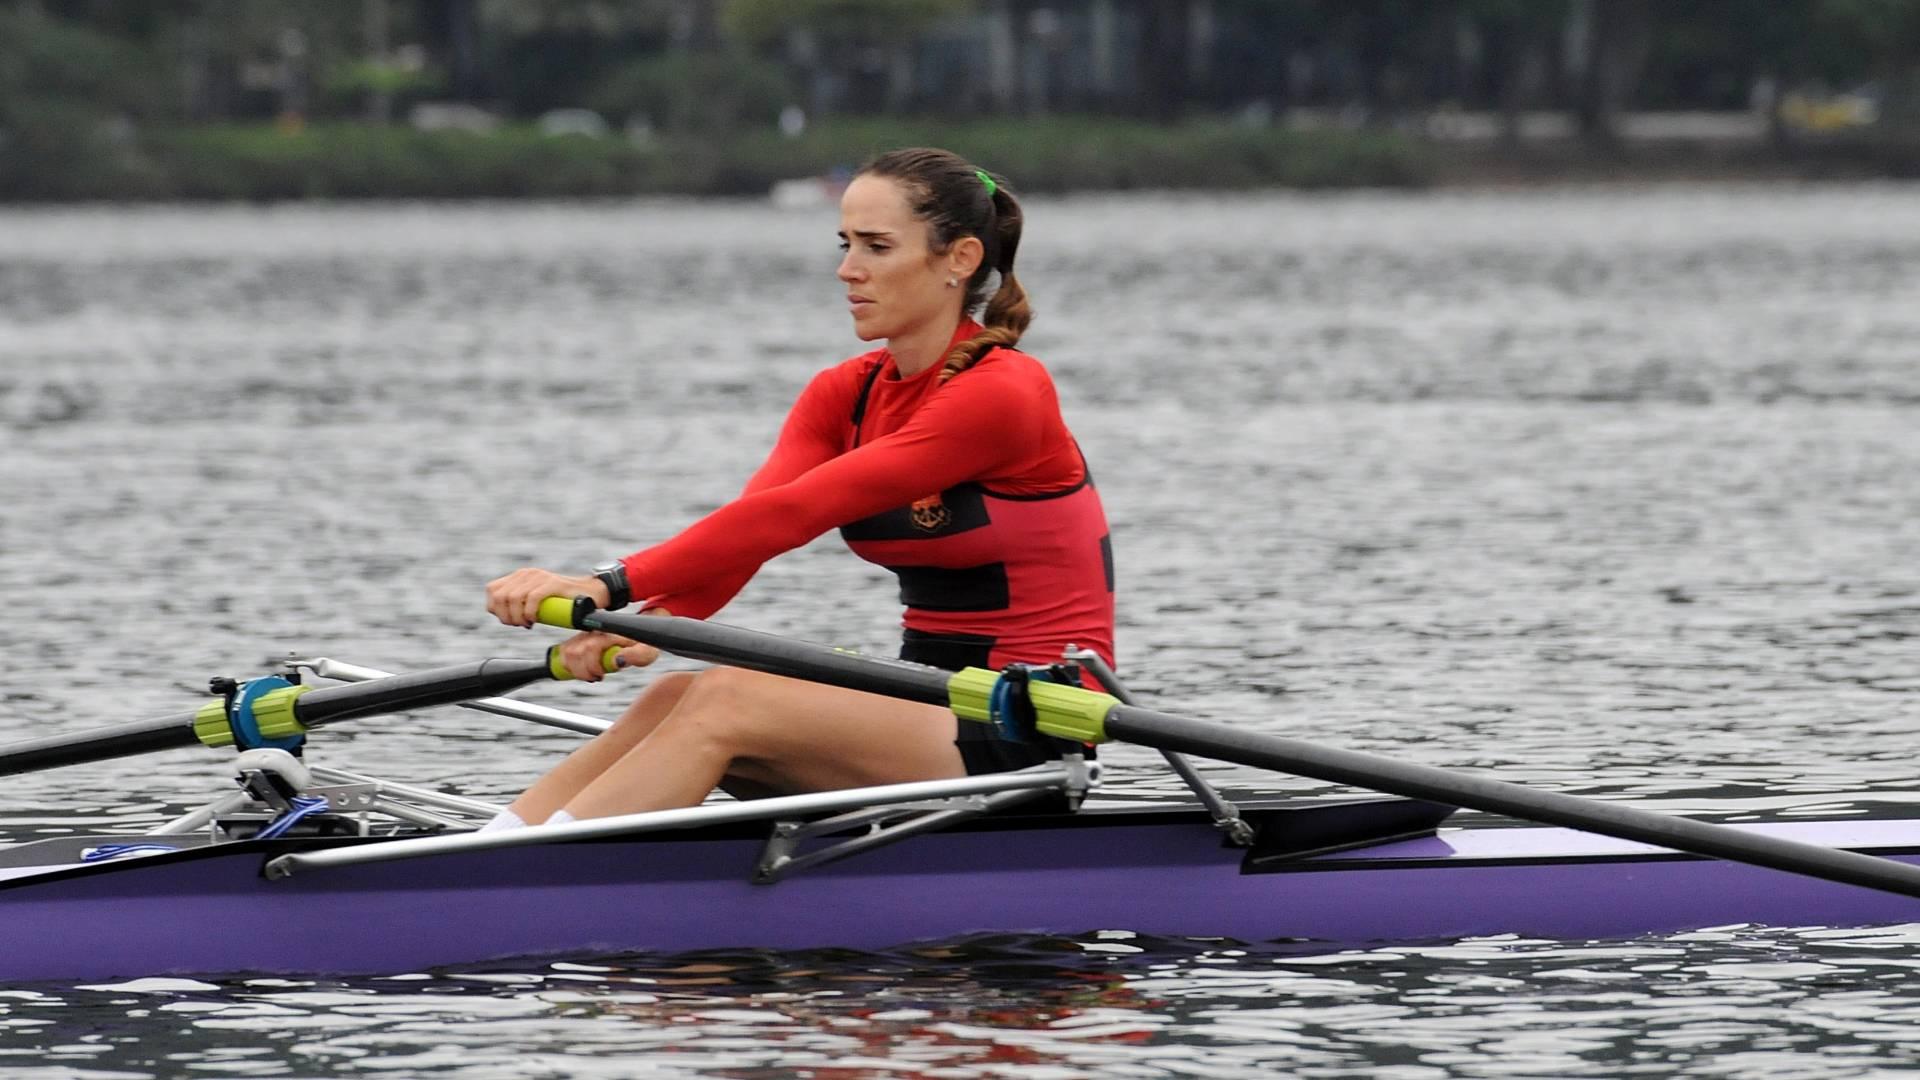 Fabiana Beltrame está na final do Campeonato Mundial na Eslovênia (01/09/2011)